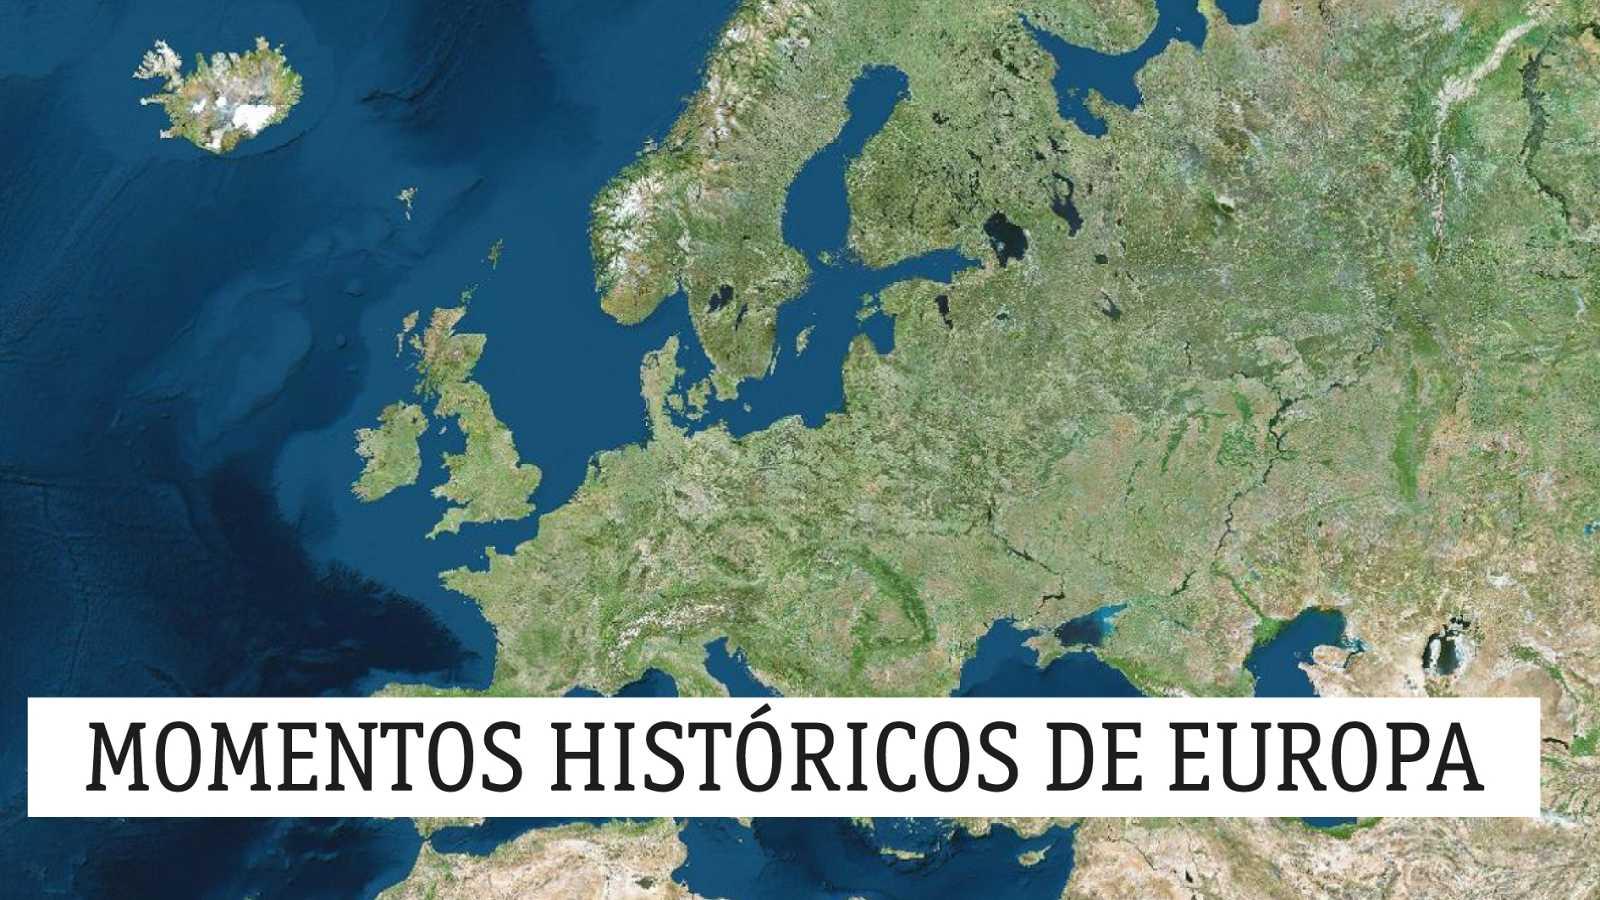 Momentos históricos de Europa - Robert Schuman y Jean Monnet: los padres de Europa - 05/07/20 - escuchar ahora